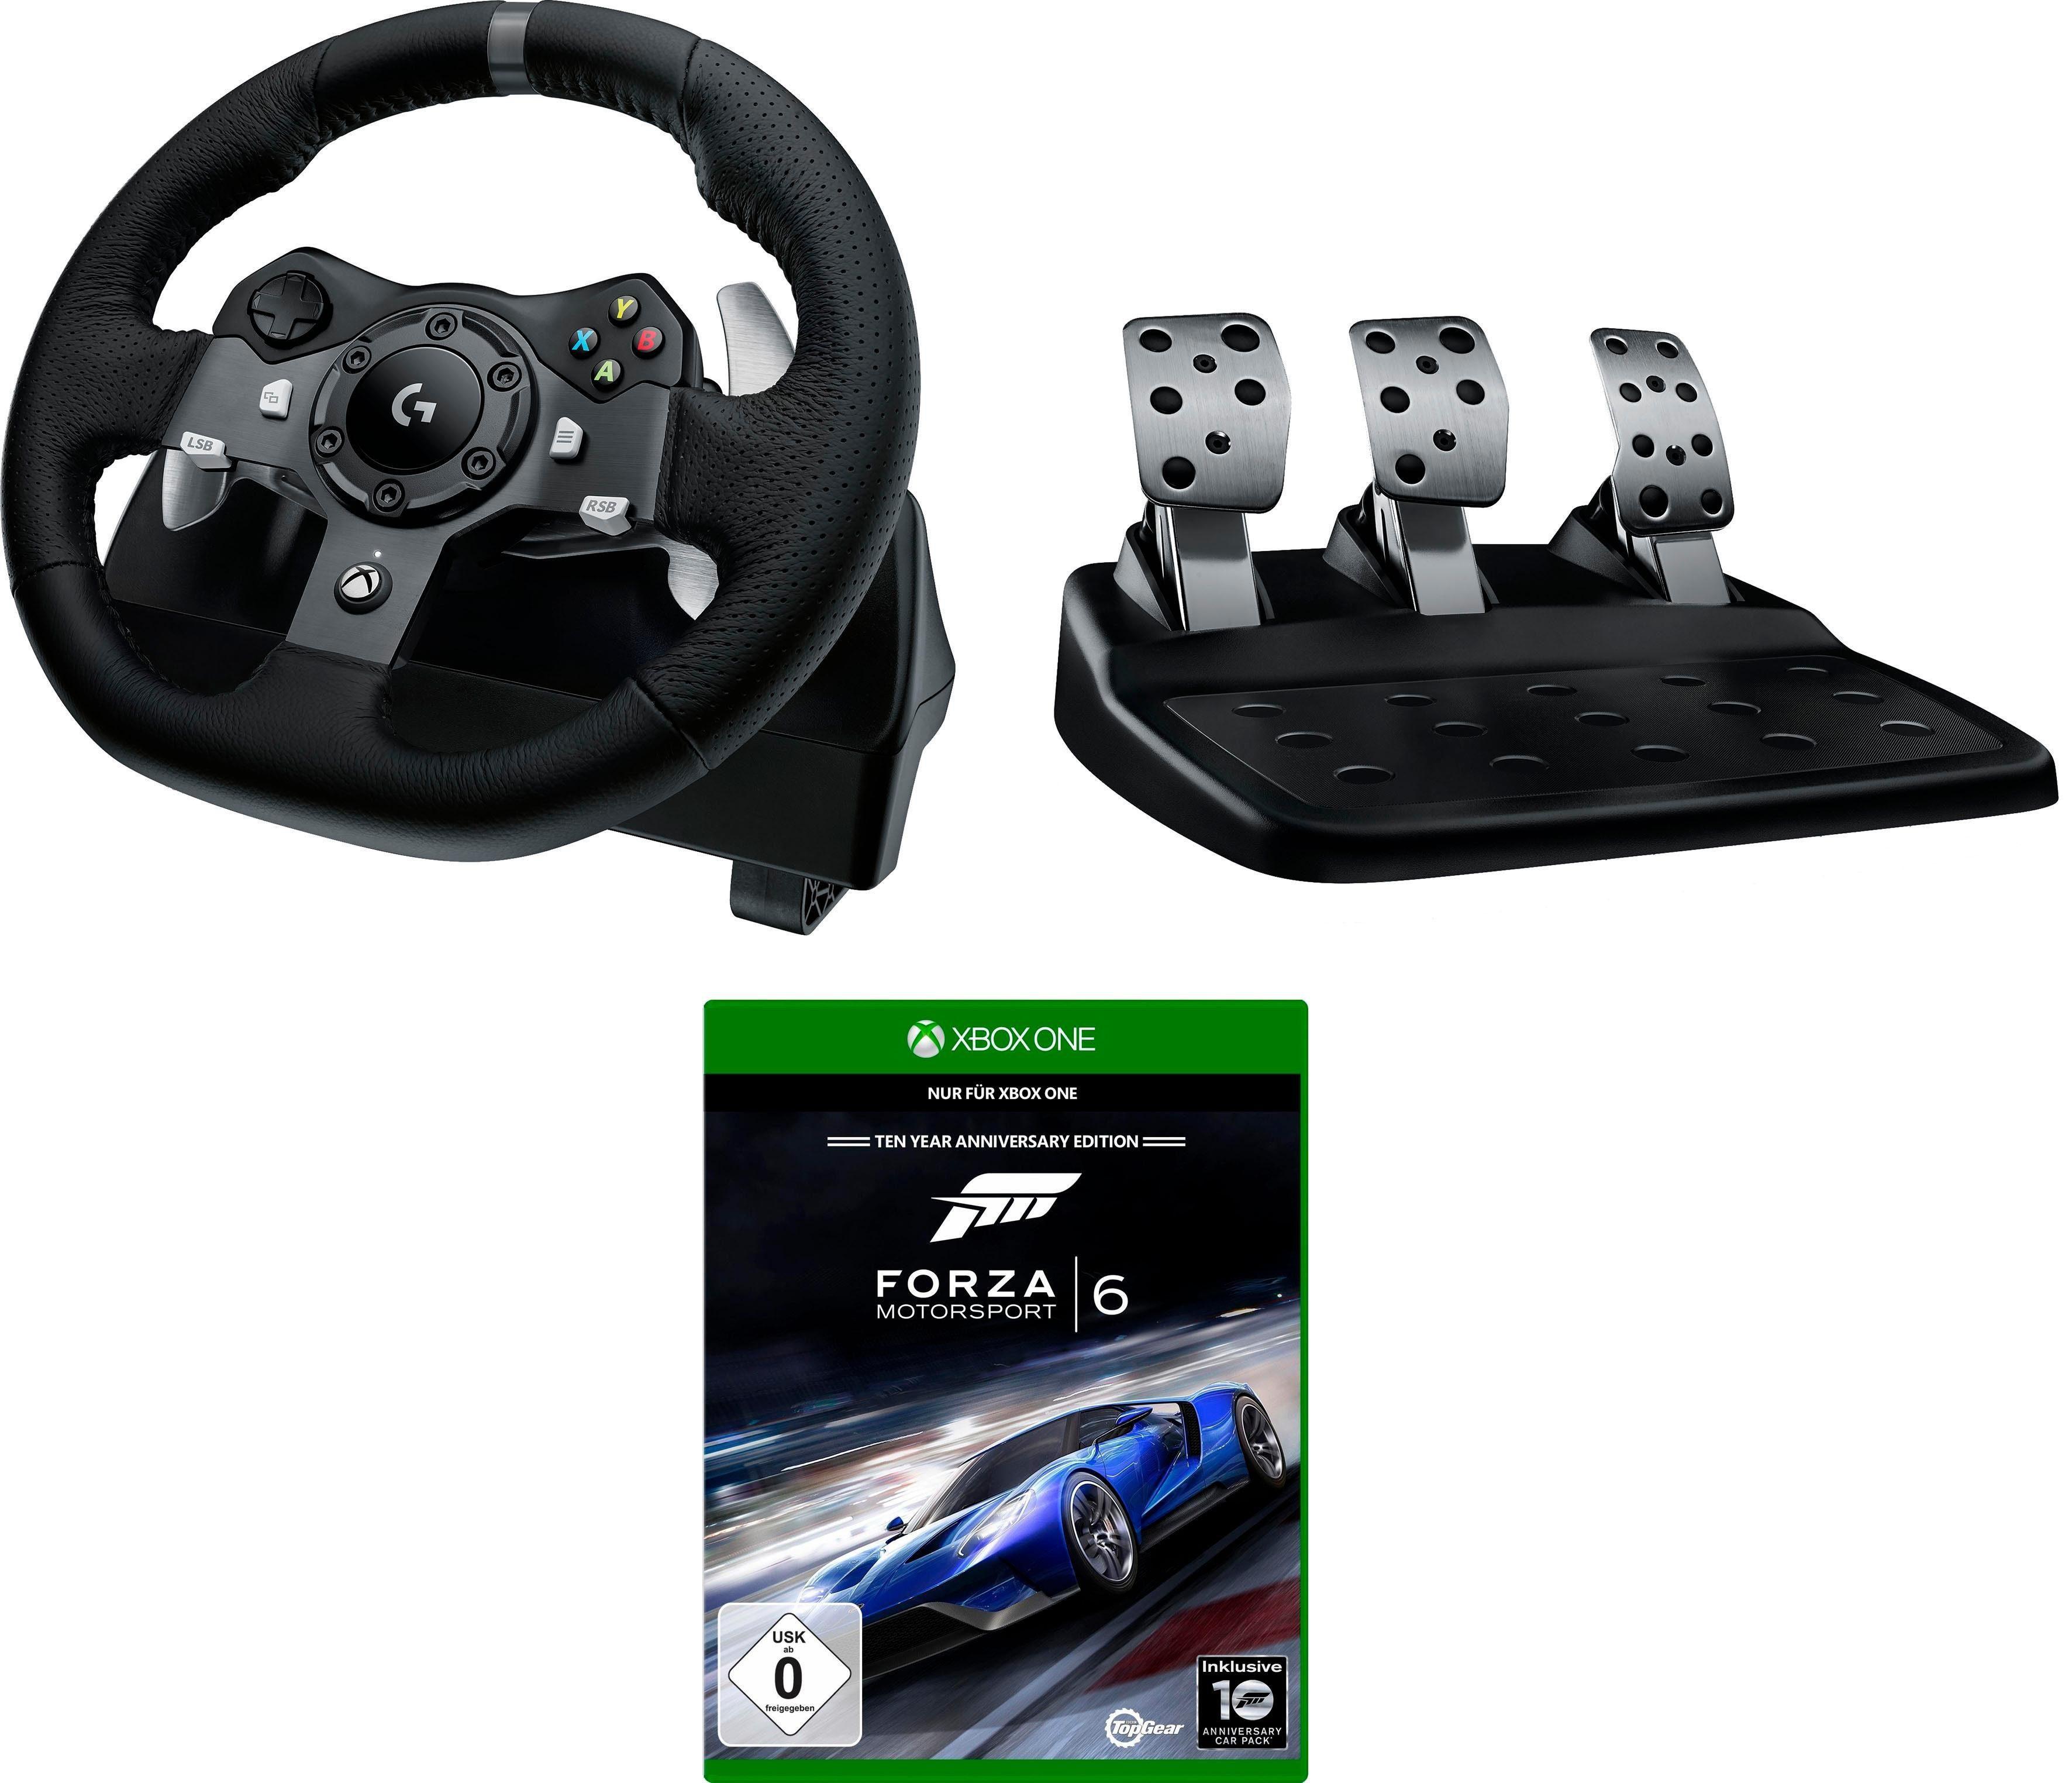 Logitech Games »G920 Driving Force Racing Wheel USB - EMEA inkl. Forza Motorsport 6 Xbox One« Lenkrad (Set)